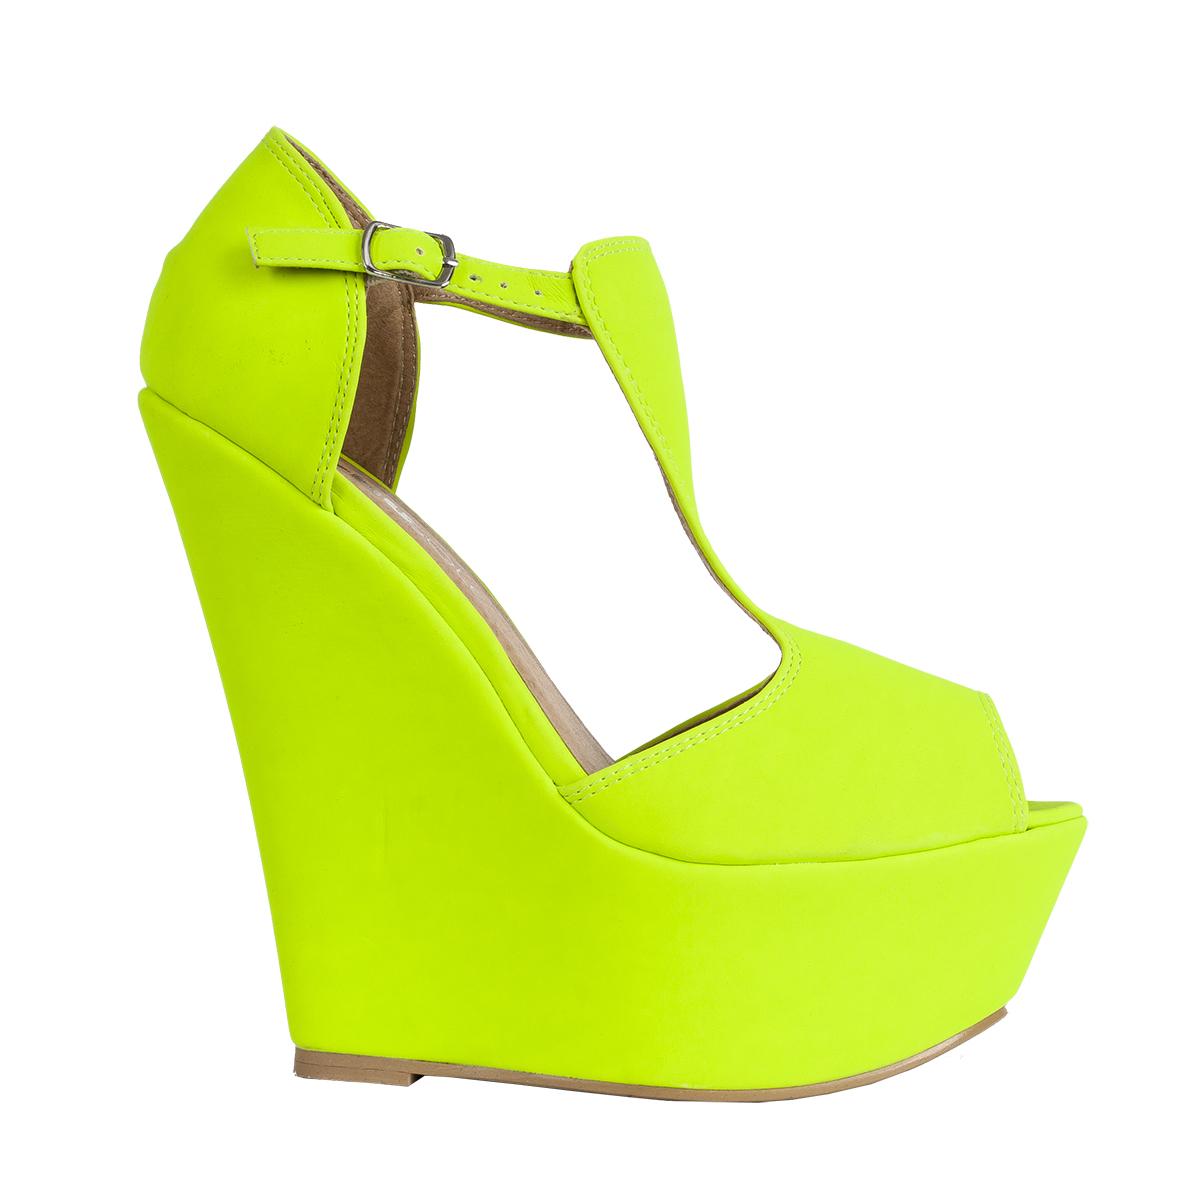 new womens t bar peep toe platform wedge high heel